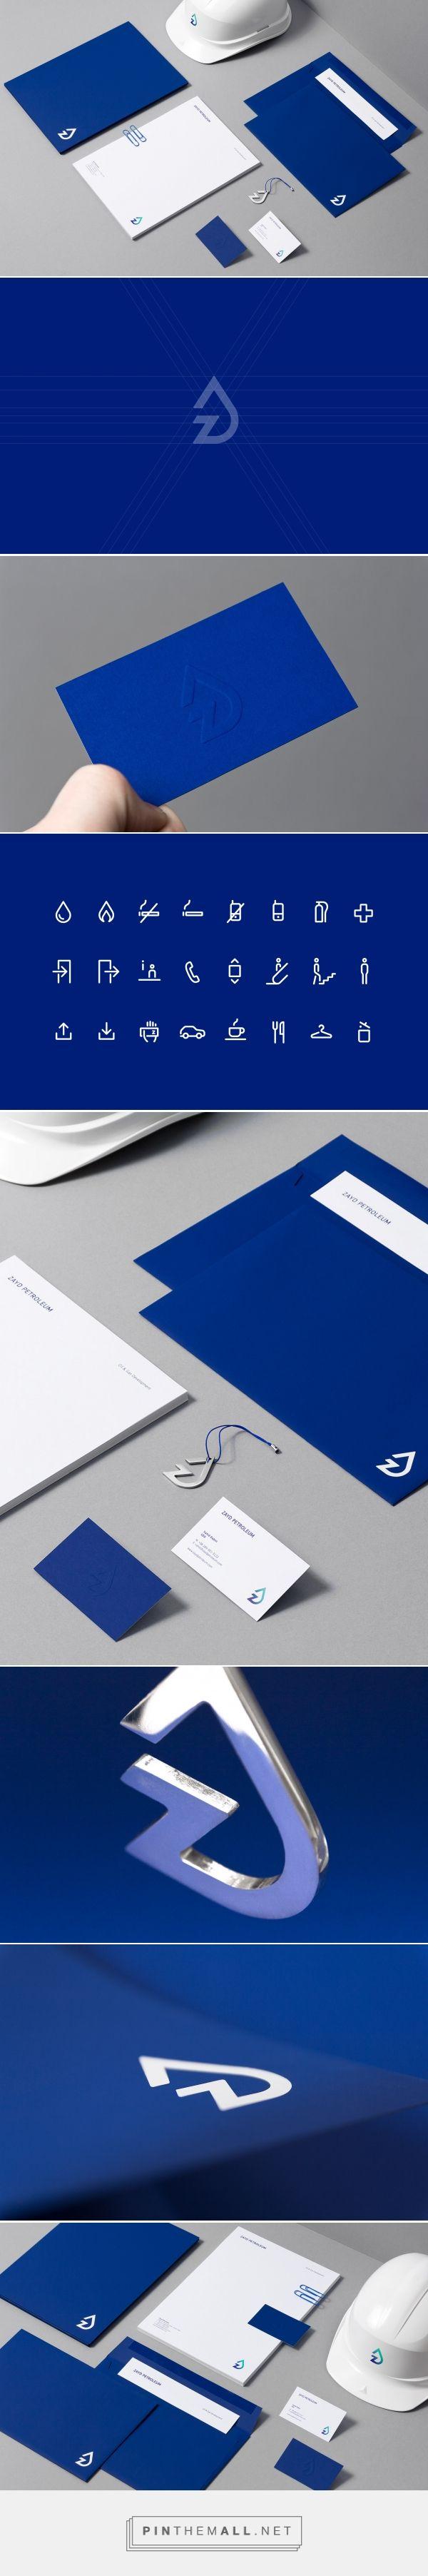 Zayd Petroleum identity designed by For brands studio.